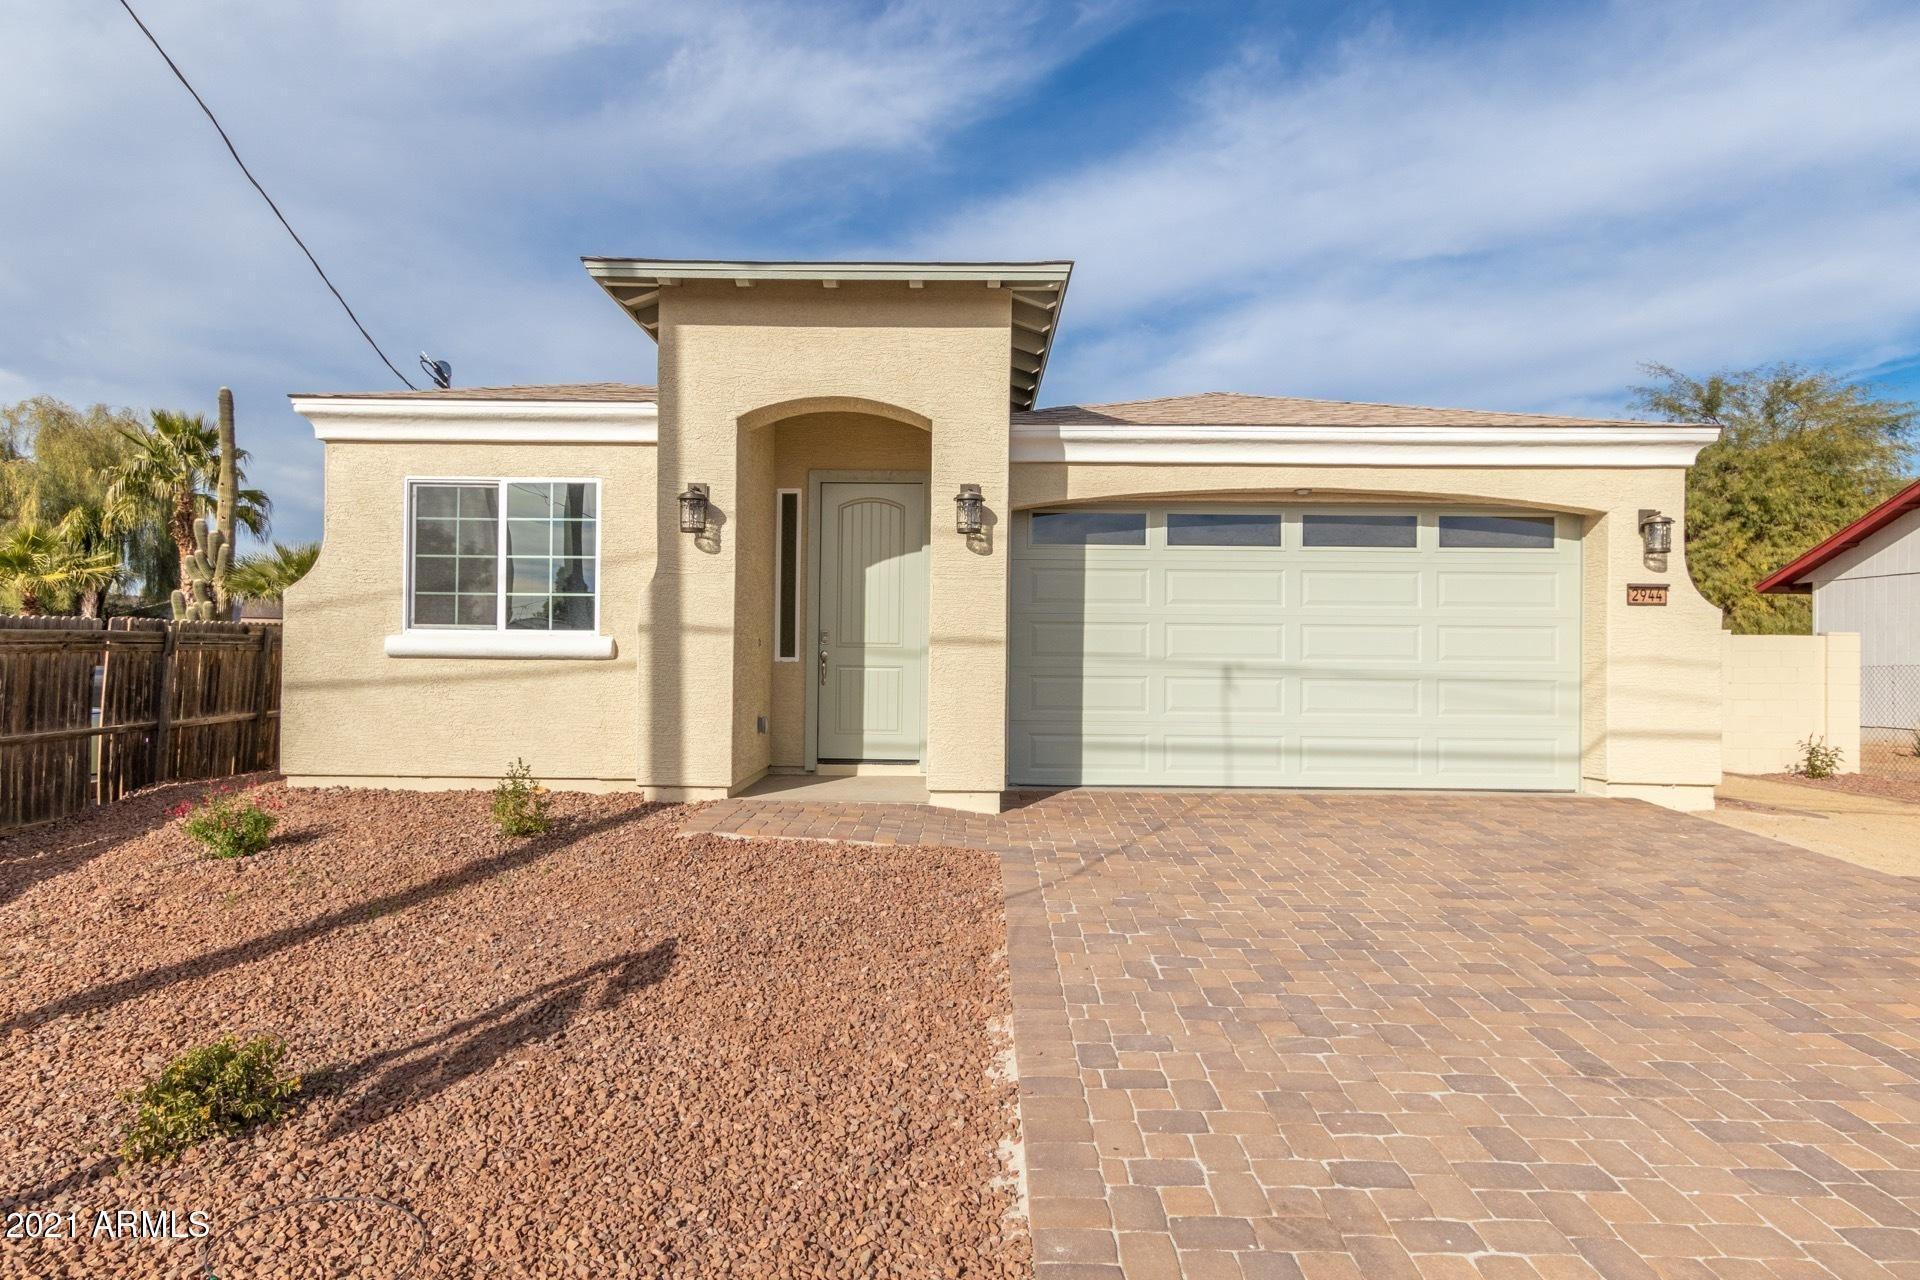 2944 W FOOTHILL Drive, Phoenix, AZ 85027 - MLS#: 6178774